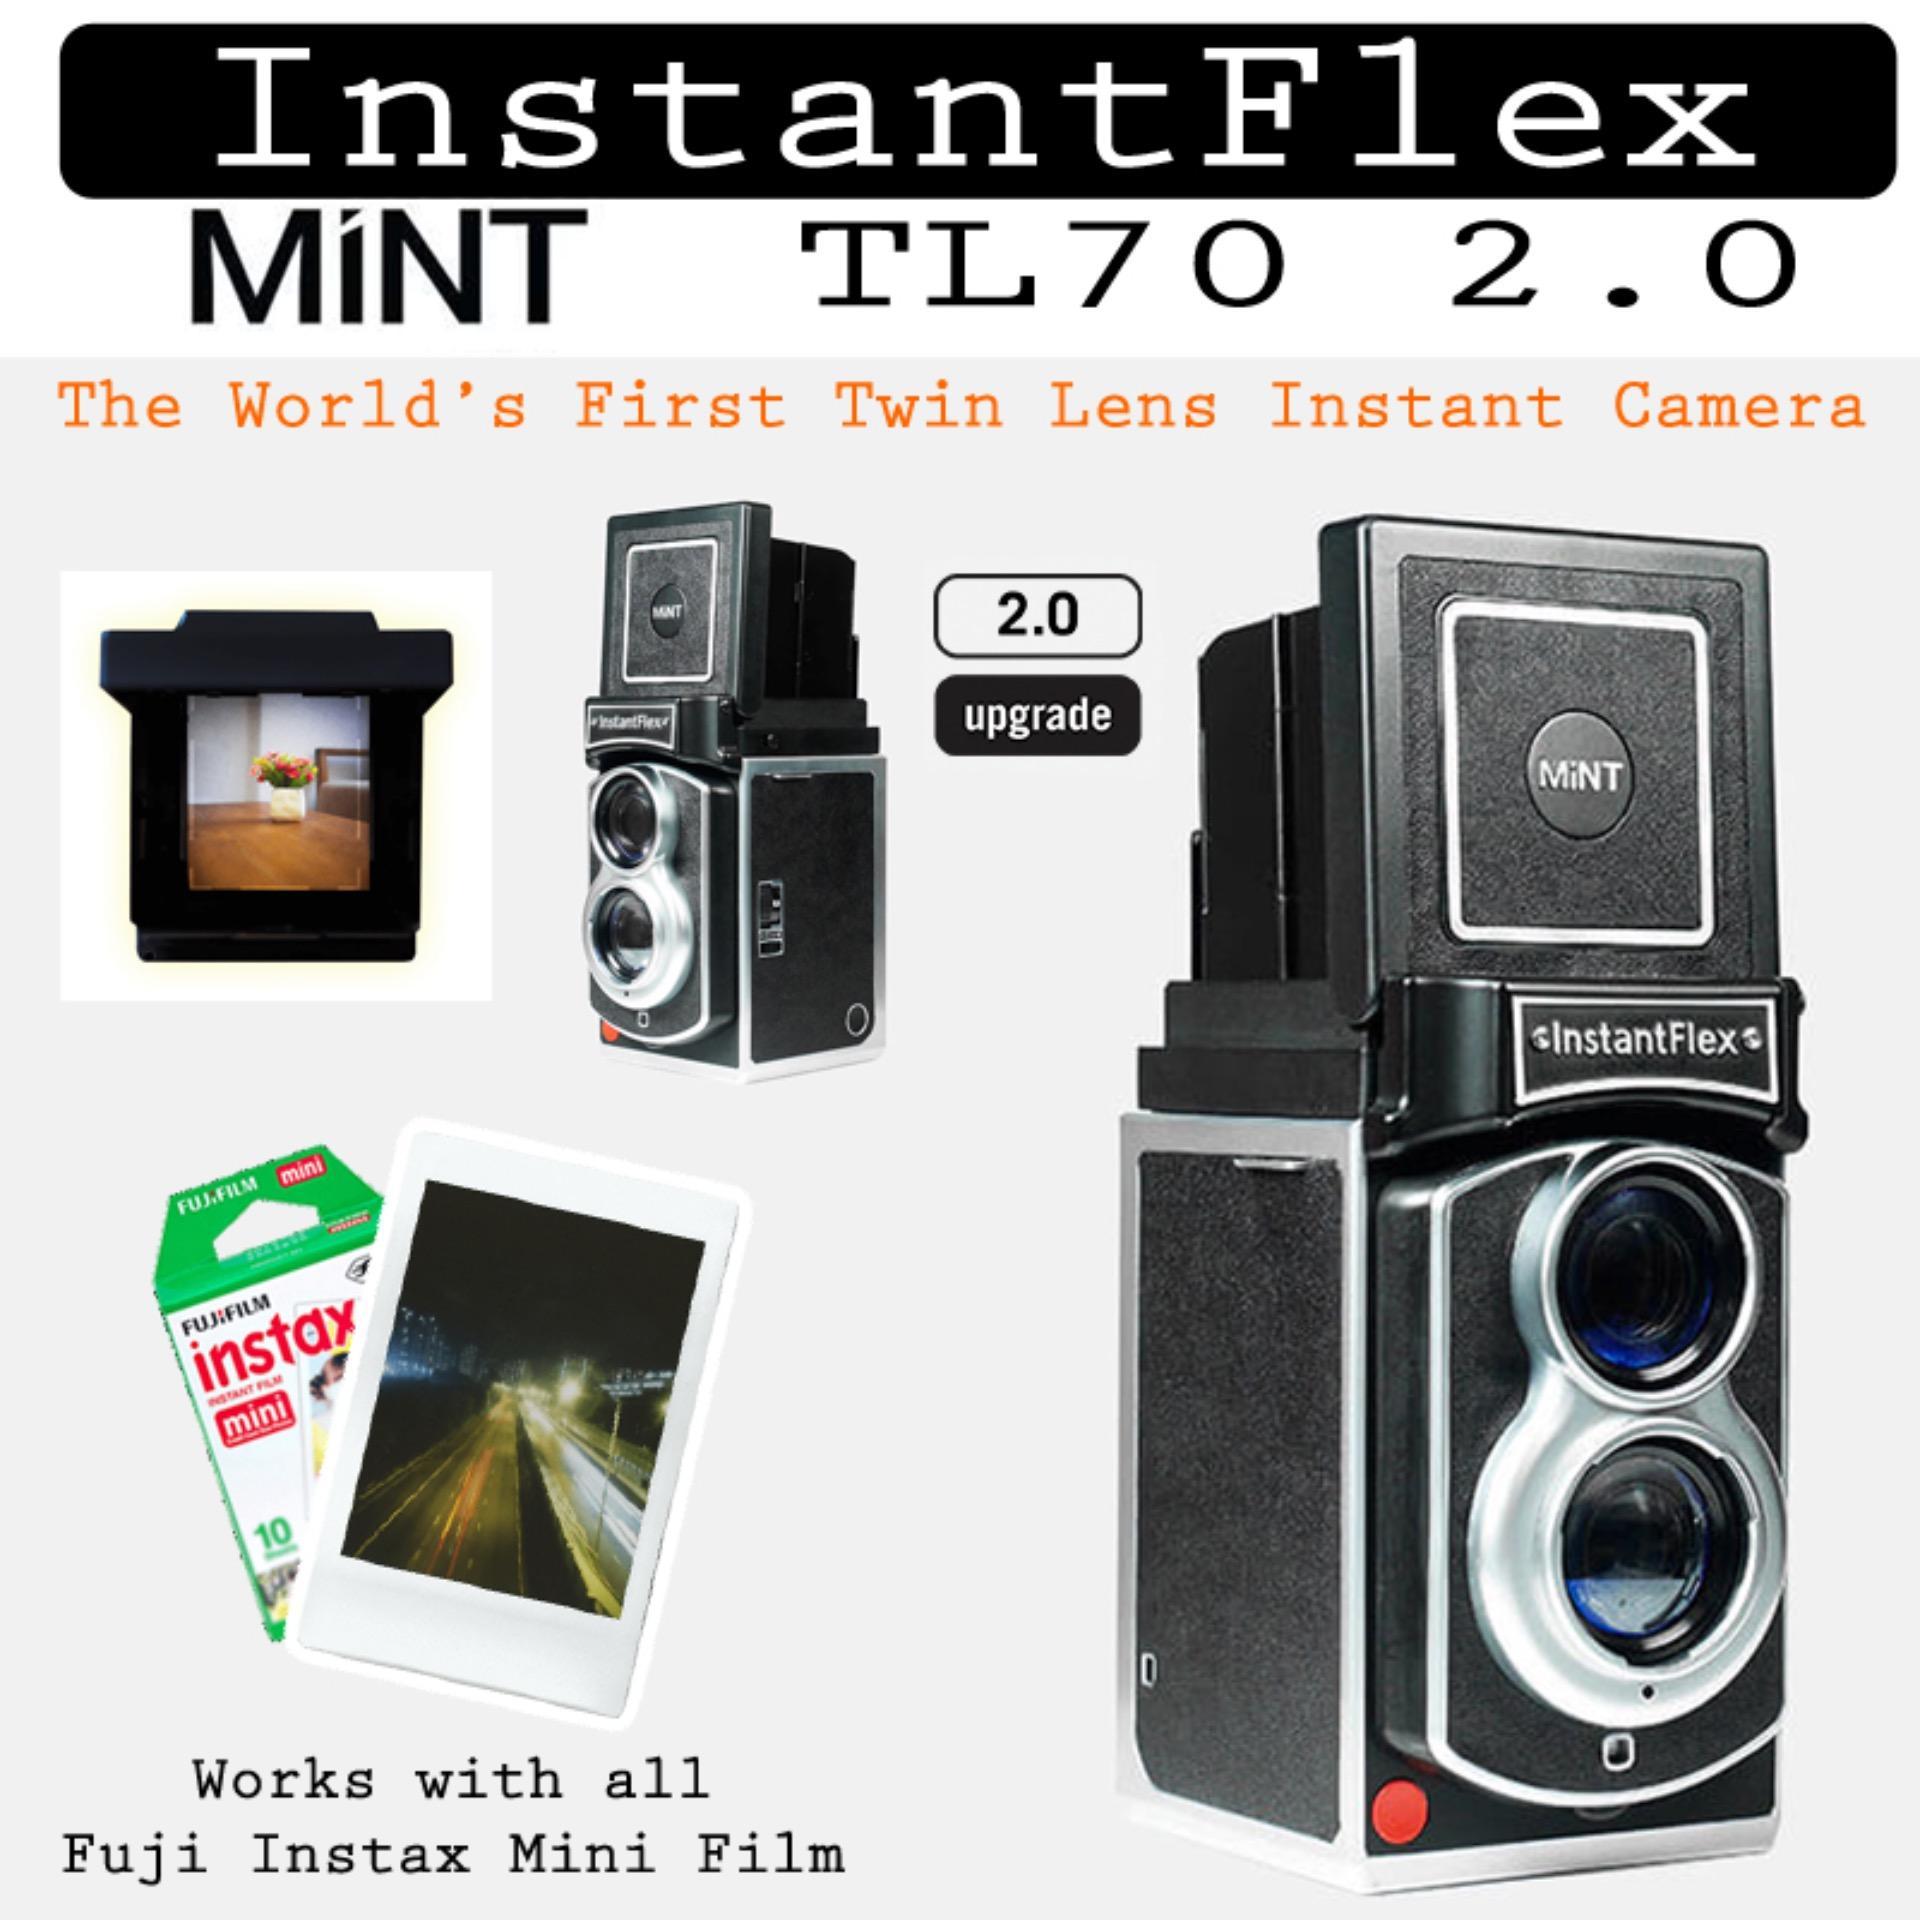 MiNT InstantFlex TL 70 2.0